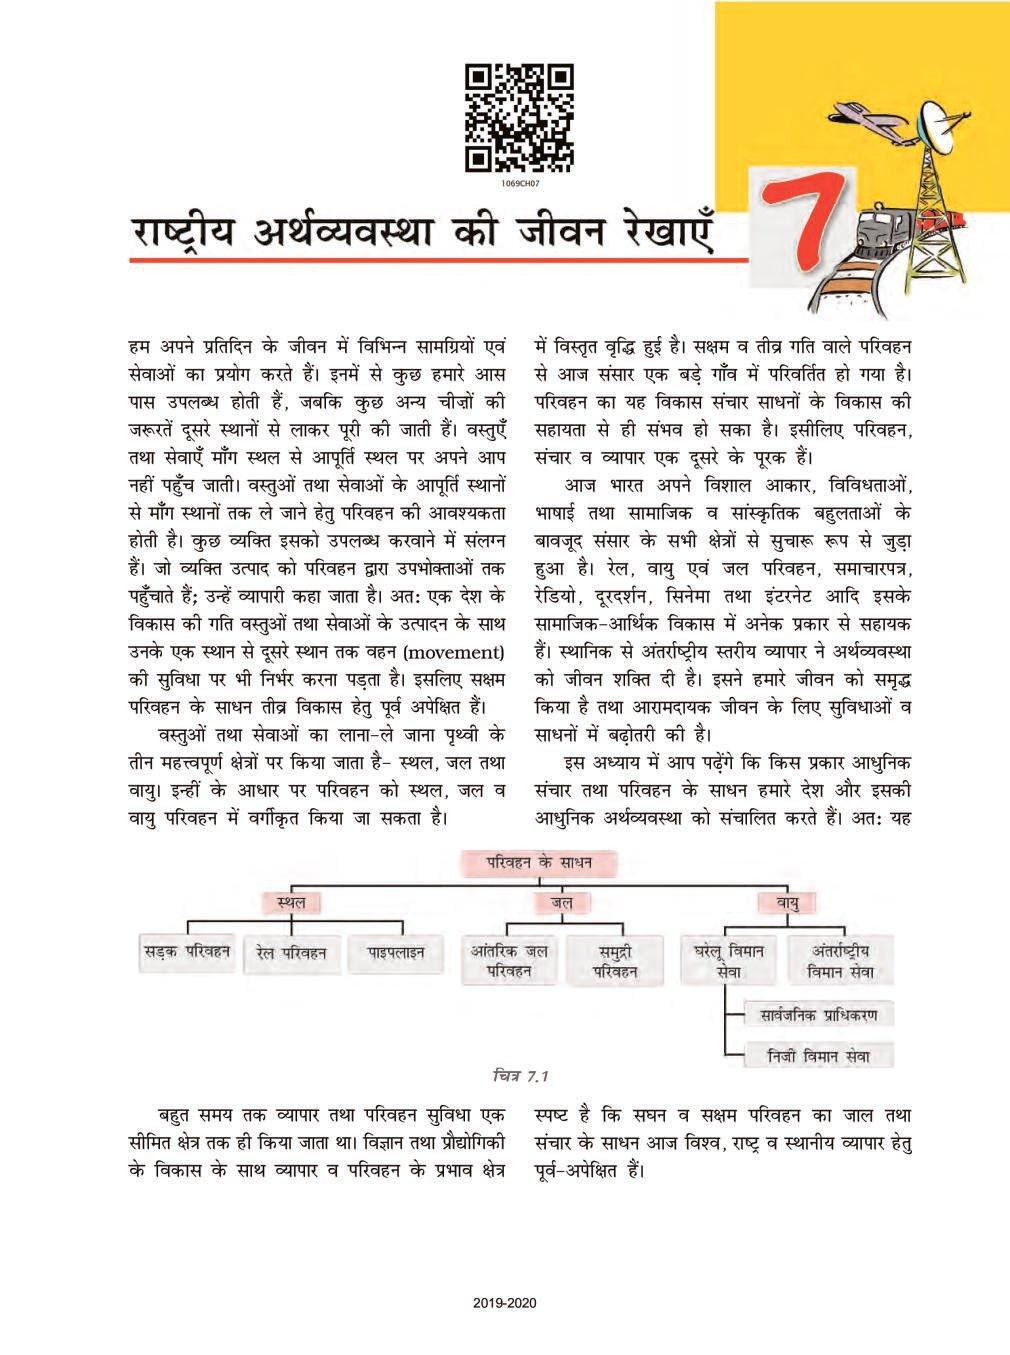 NCERT Book Class 10 Social Science (भूगोल) Chapter 7 राष्ट्रीय अर्थव्यवस्था की जीवन रेखाएँ - Page 1